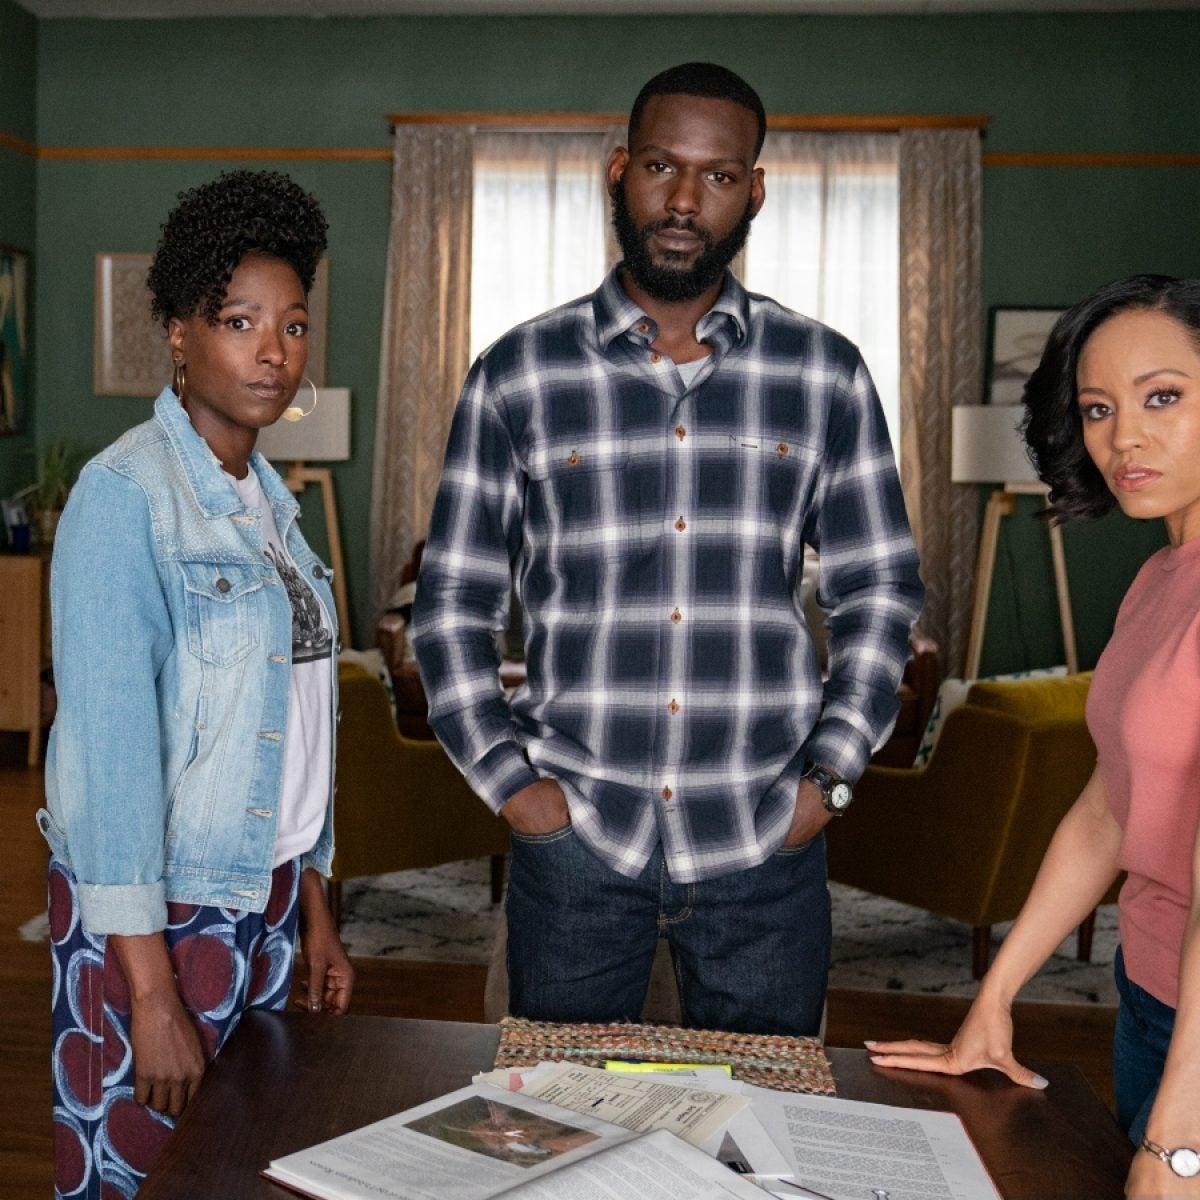 Kofi Siriboe On Expanding The View Of Black Manhood On Screen